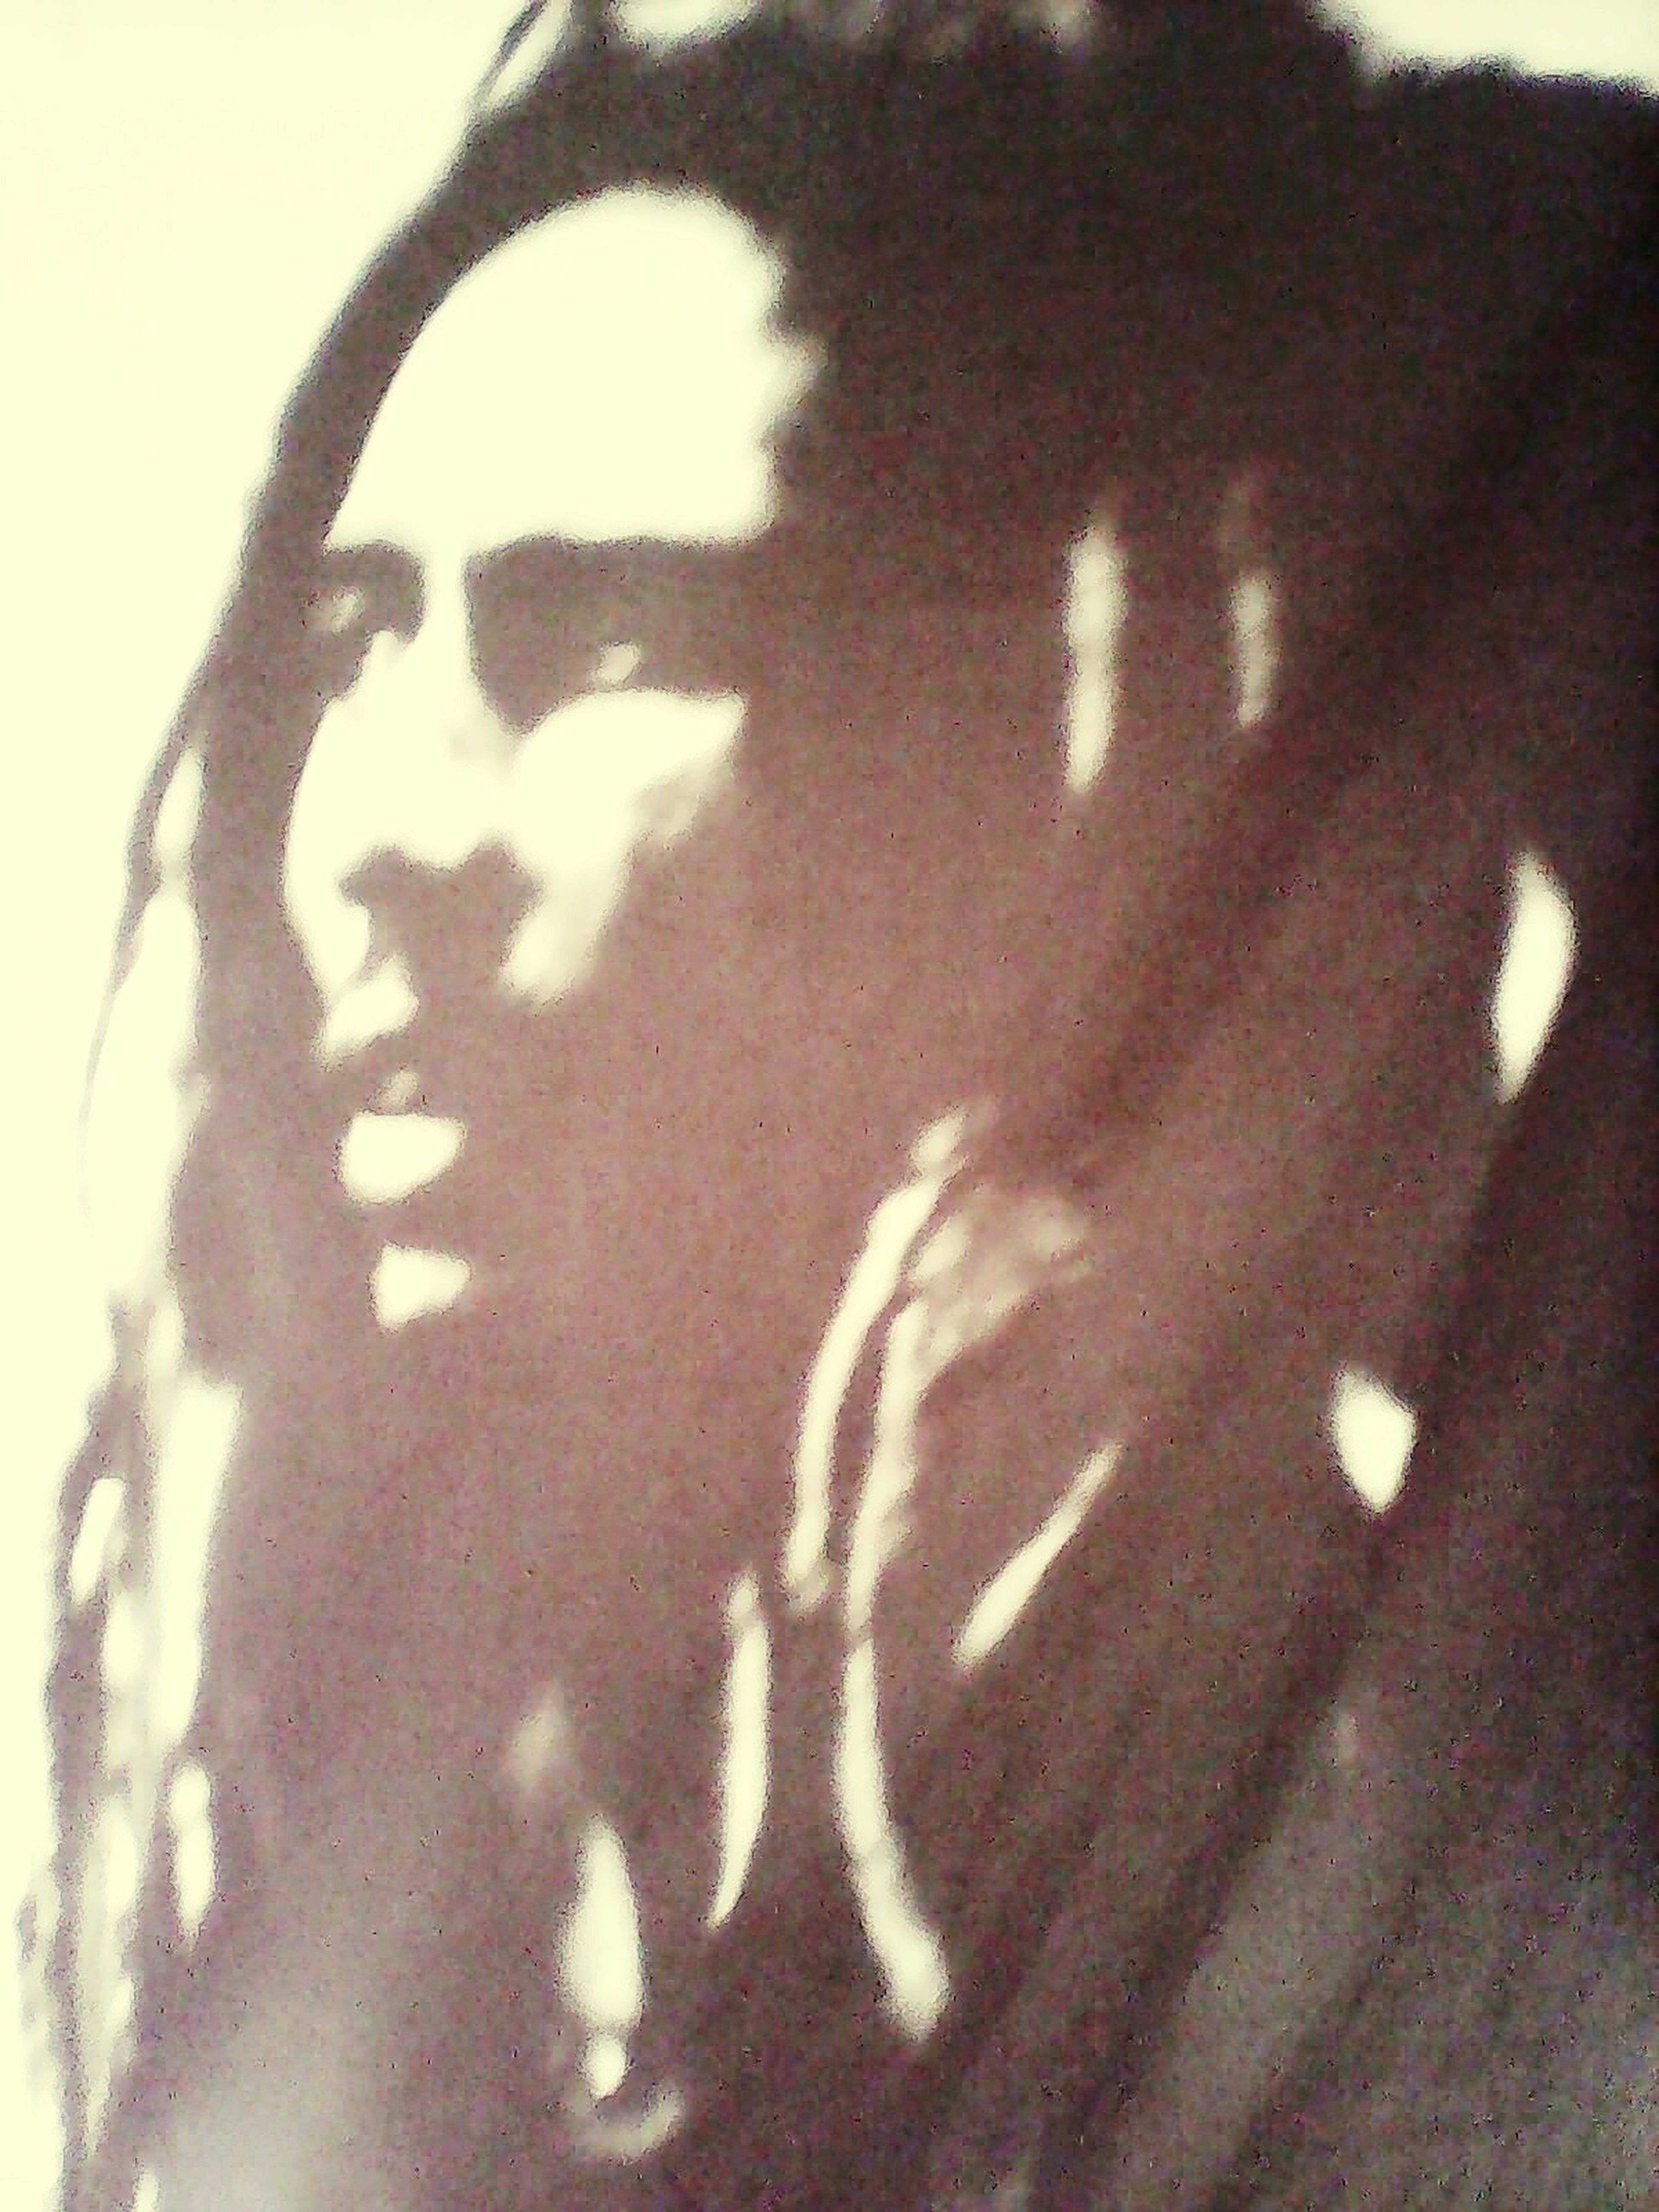 I&I Chillin Out At Home Taking Photos Love Bob Marley Flags One Love Rastafari